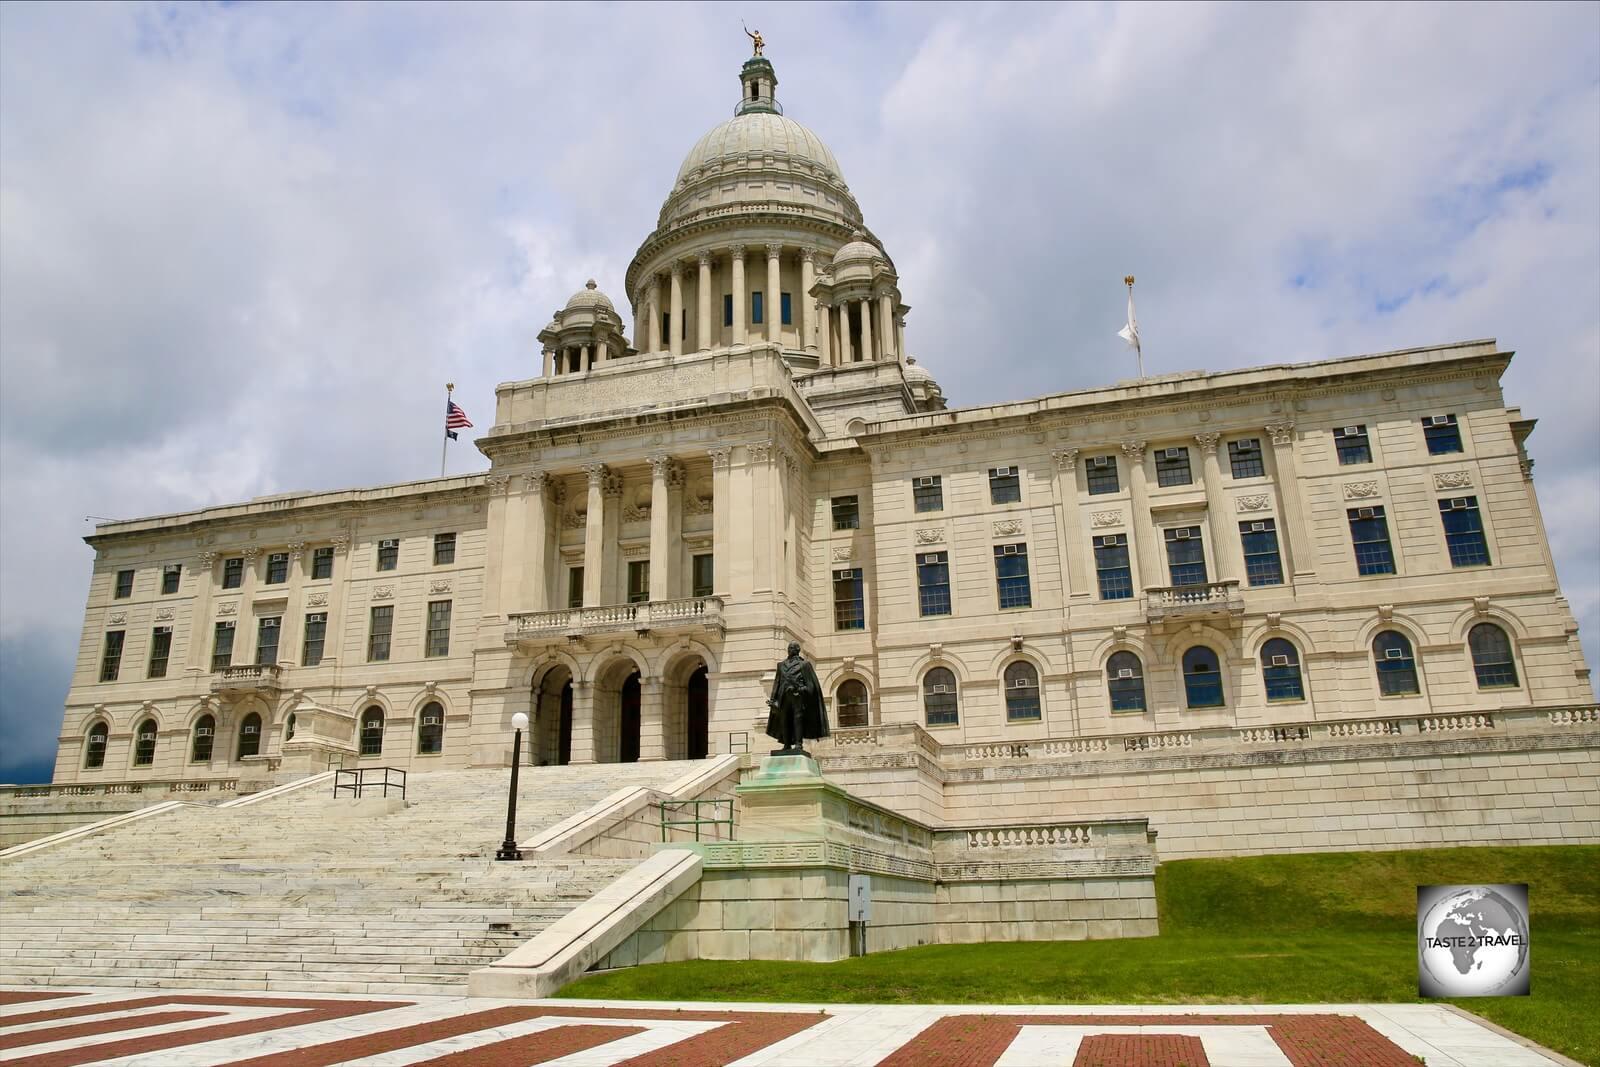 Rhode Island State Capitol